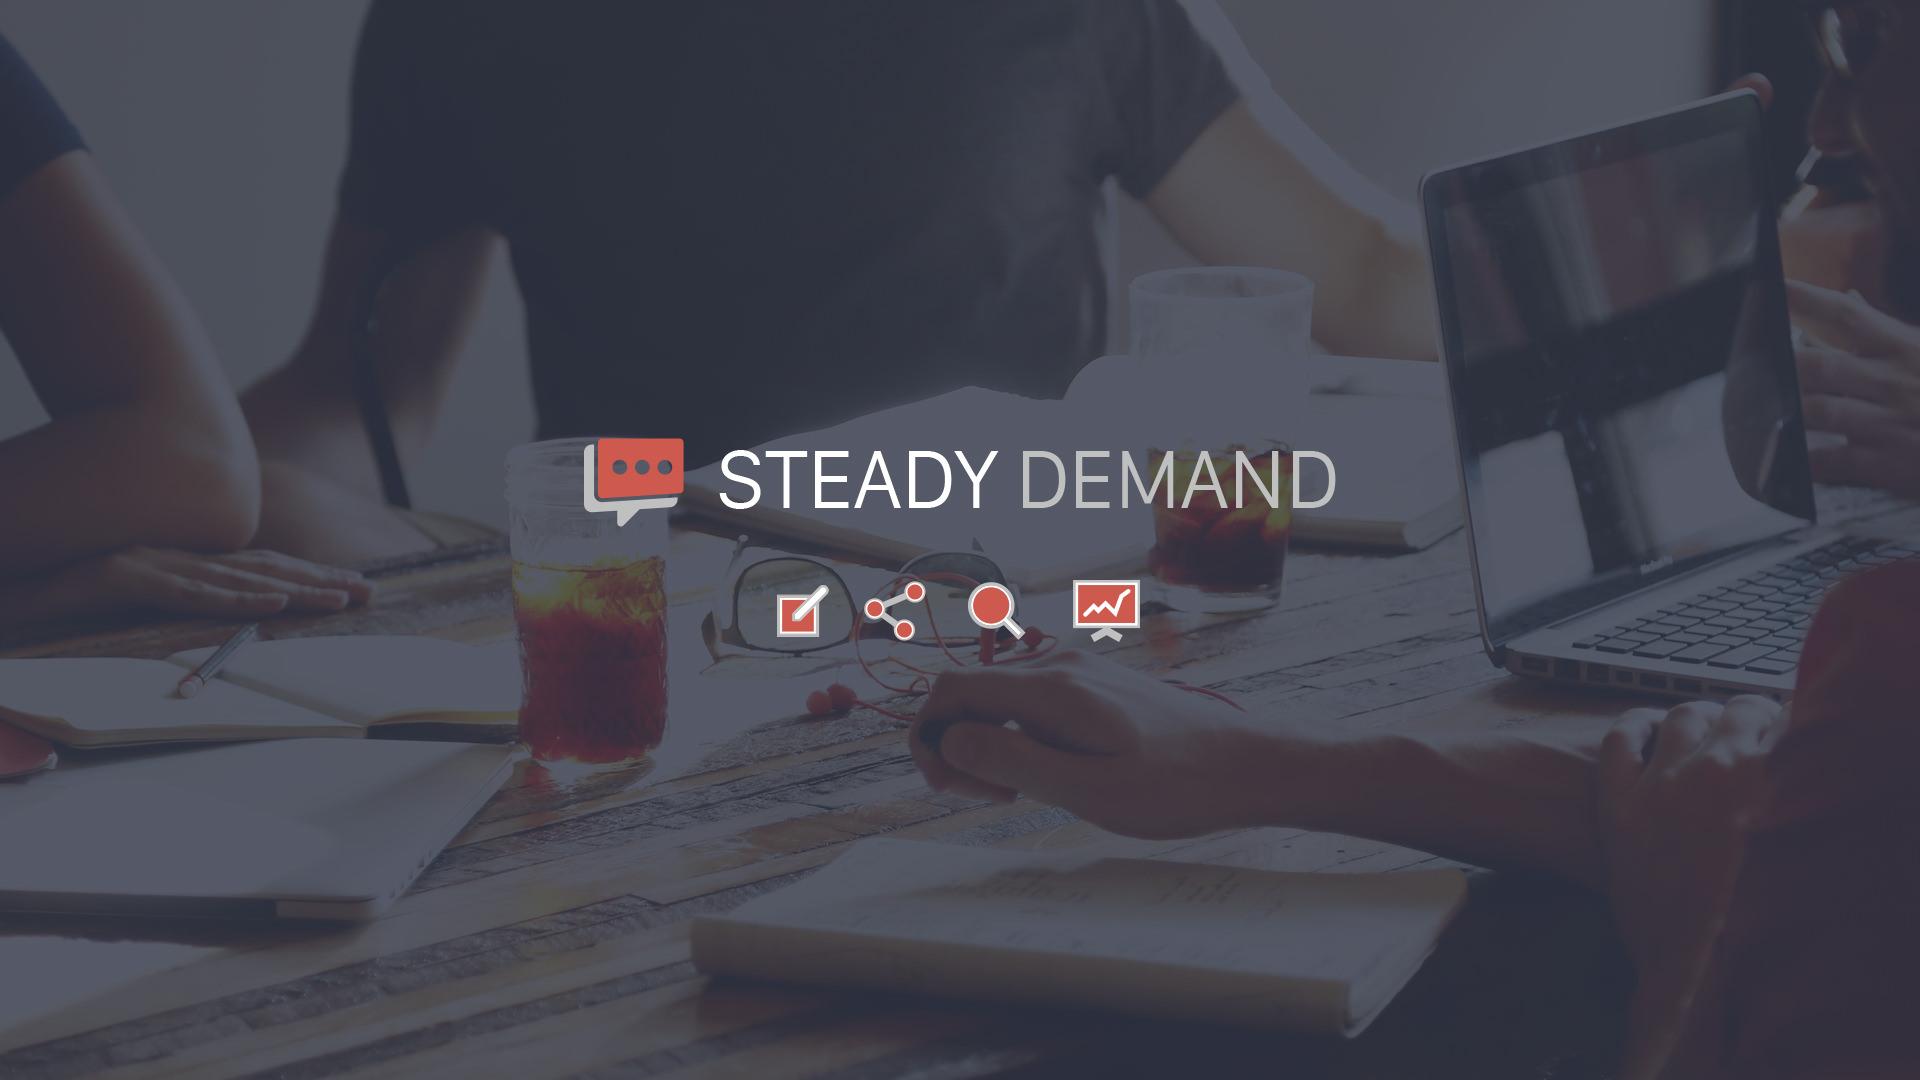 Steady Demand - Social Media Marketing Agency